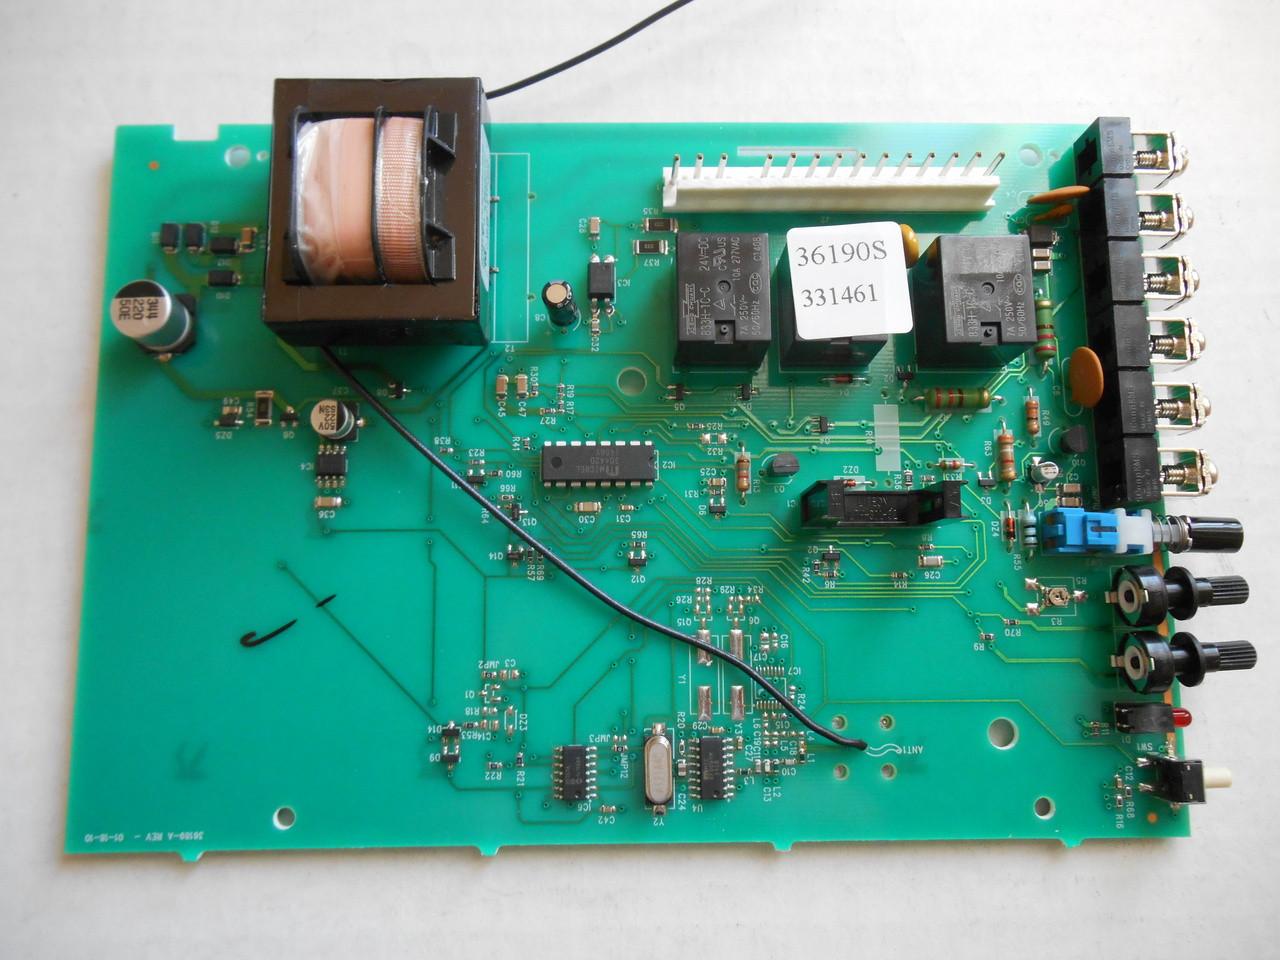 hight resolution of circuit board genie chainglide 20380s overhead door parts online genie pro max capacitor genie pro max circuit board wiring diagram